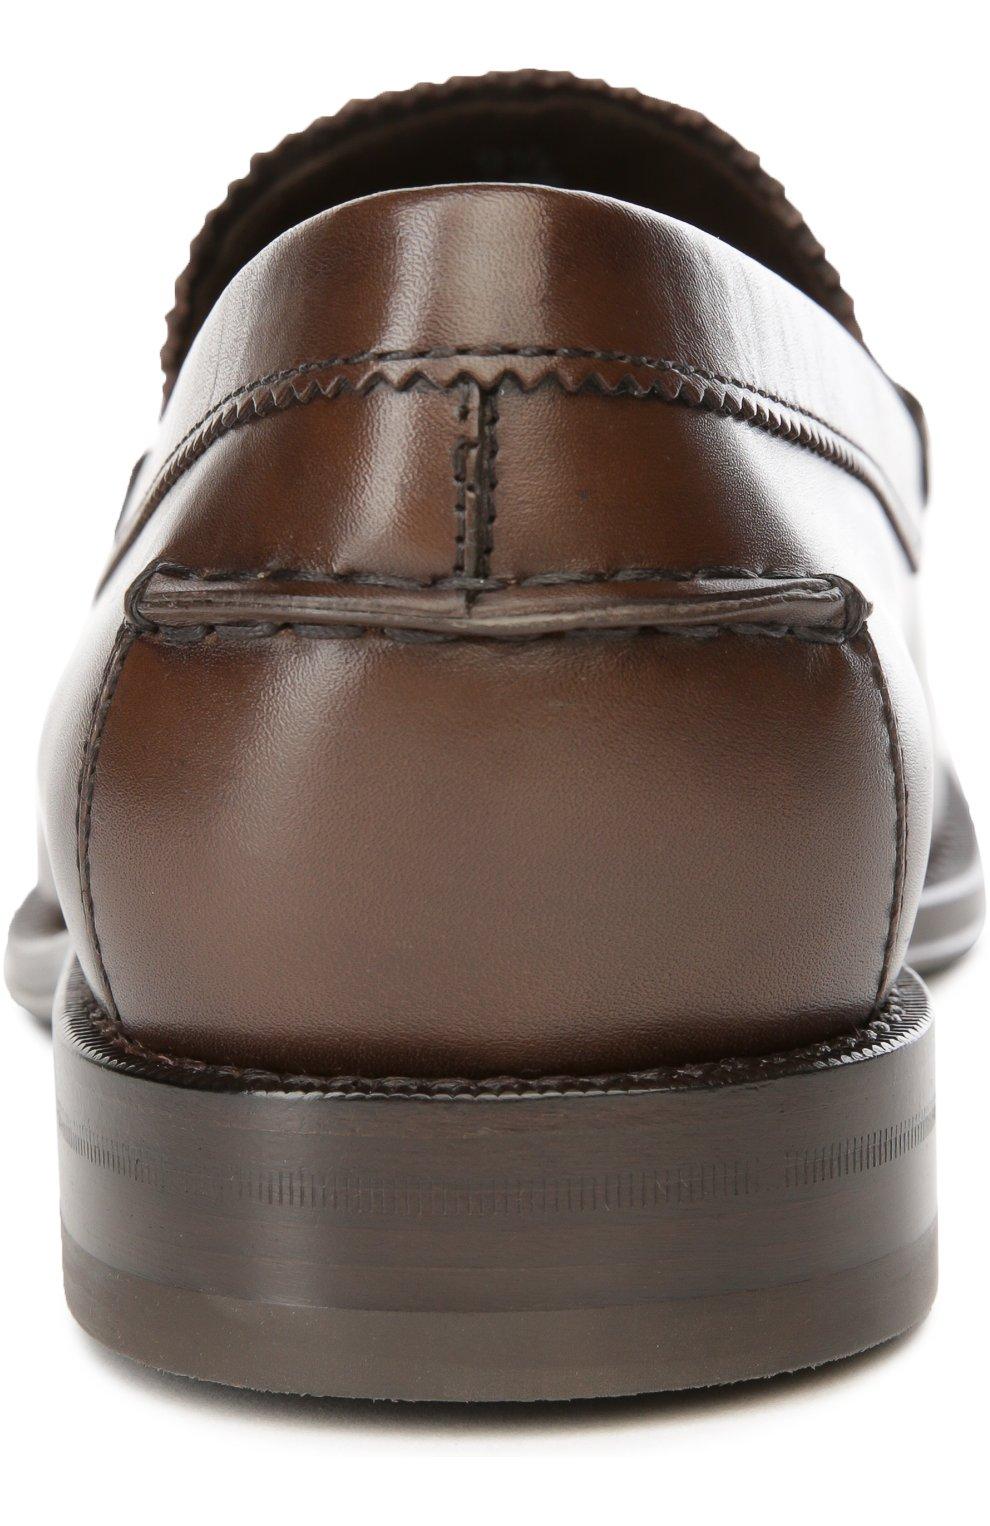 Лоферы Cuoio Formale Ro Tod's коричневые | Фото №3